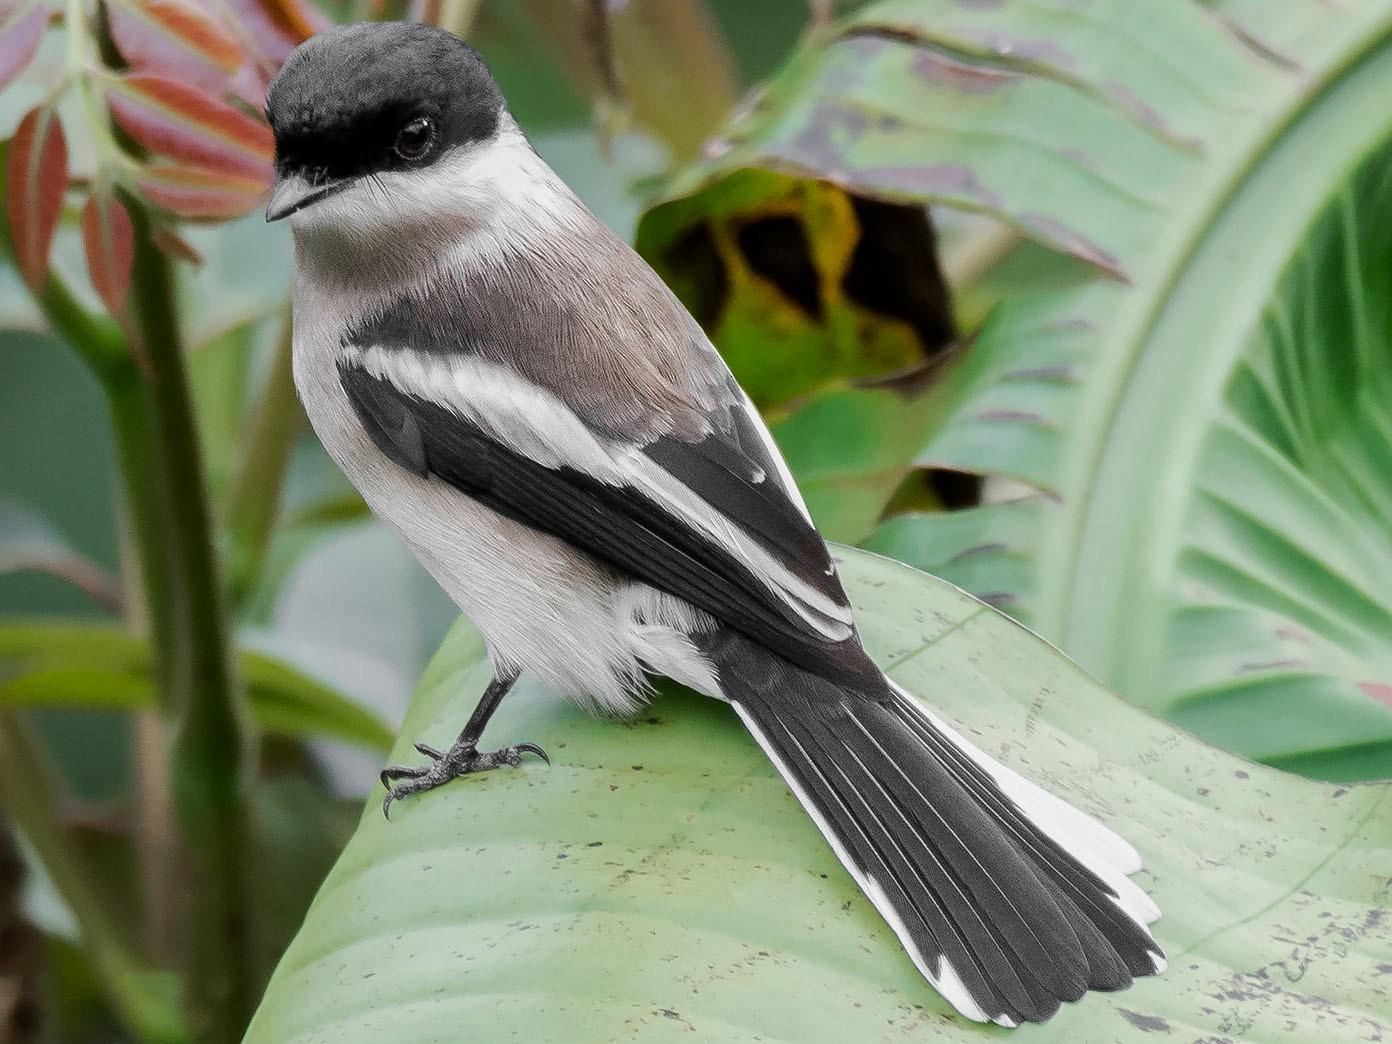 Bar-winged Flycatcher-shrike - Natthaphat Chotjuckdikul